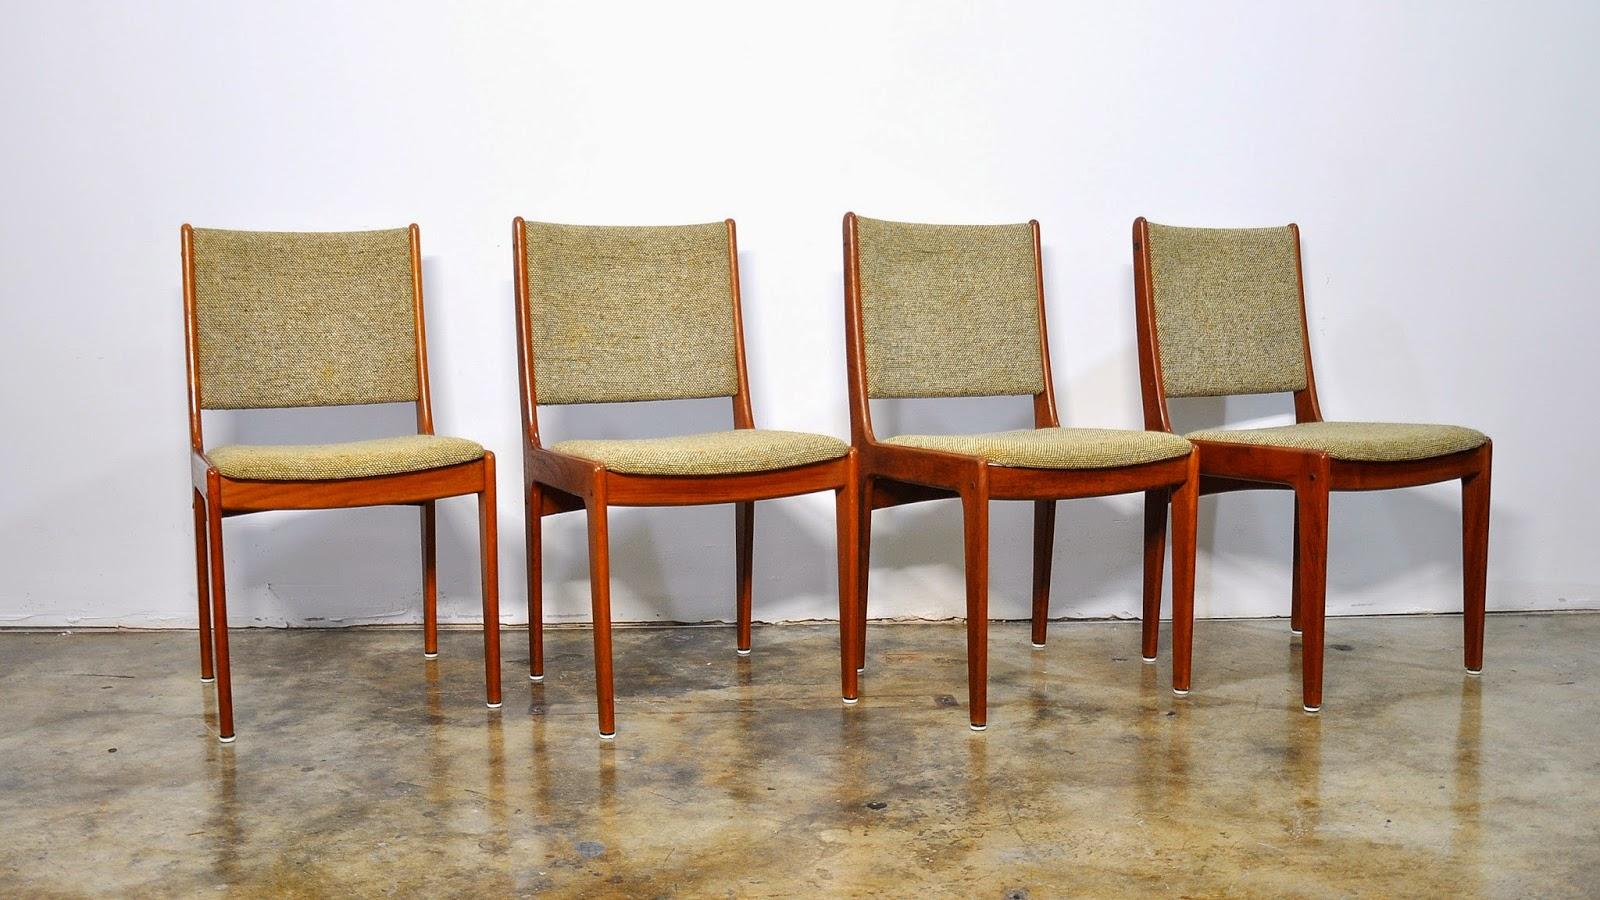 Select Modern Set Of 4 Danish Modern Teak Dining Chairs. Mid Century Pendant Light. Washer And Dryer Shelf. Mid Century Modern Mirror. Murano Chandelier. Craftmaster Furniture Reviews. Bathroom Door Ideas. Outside Light Fixtures. Small Swivel Chair